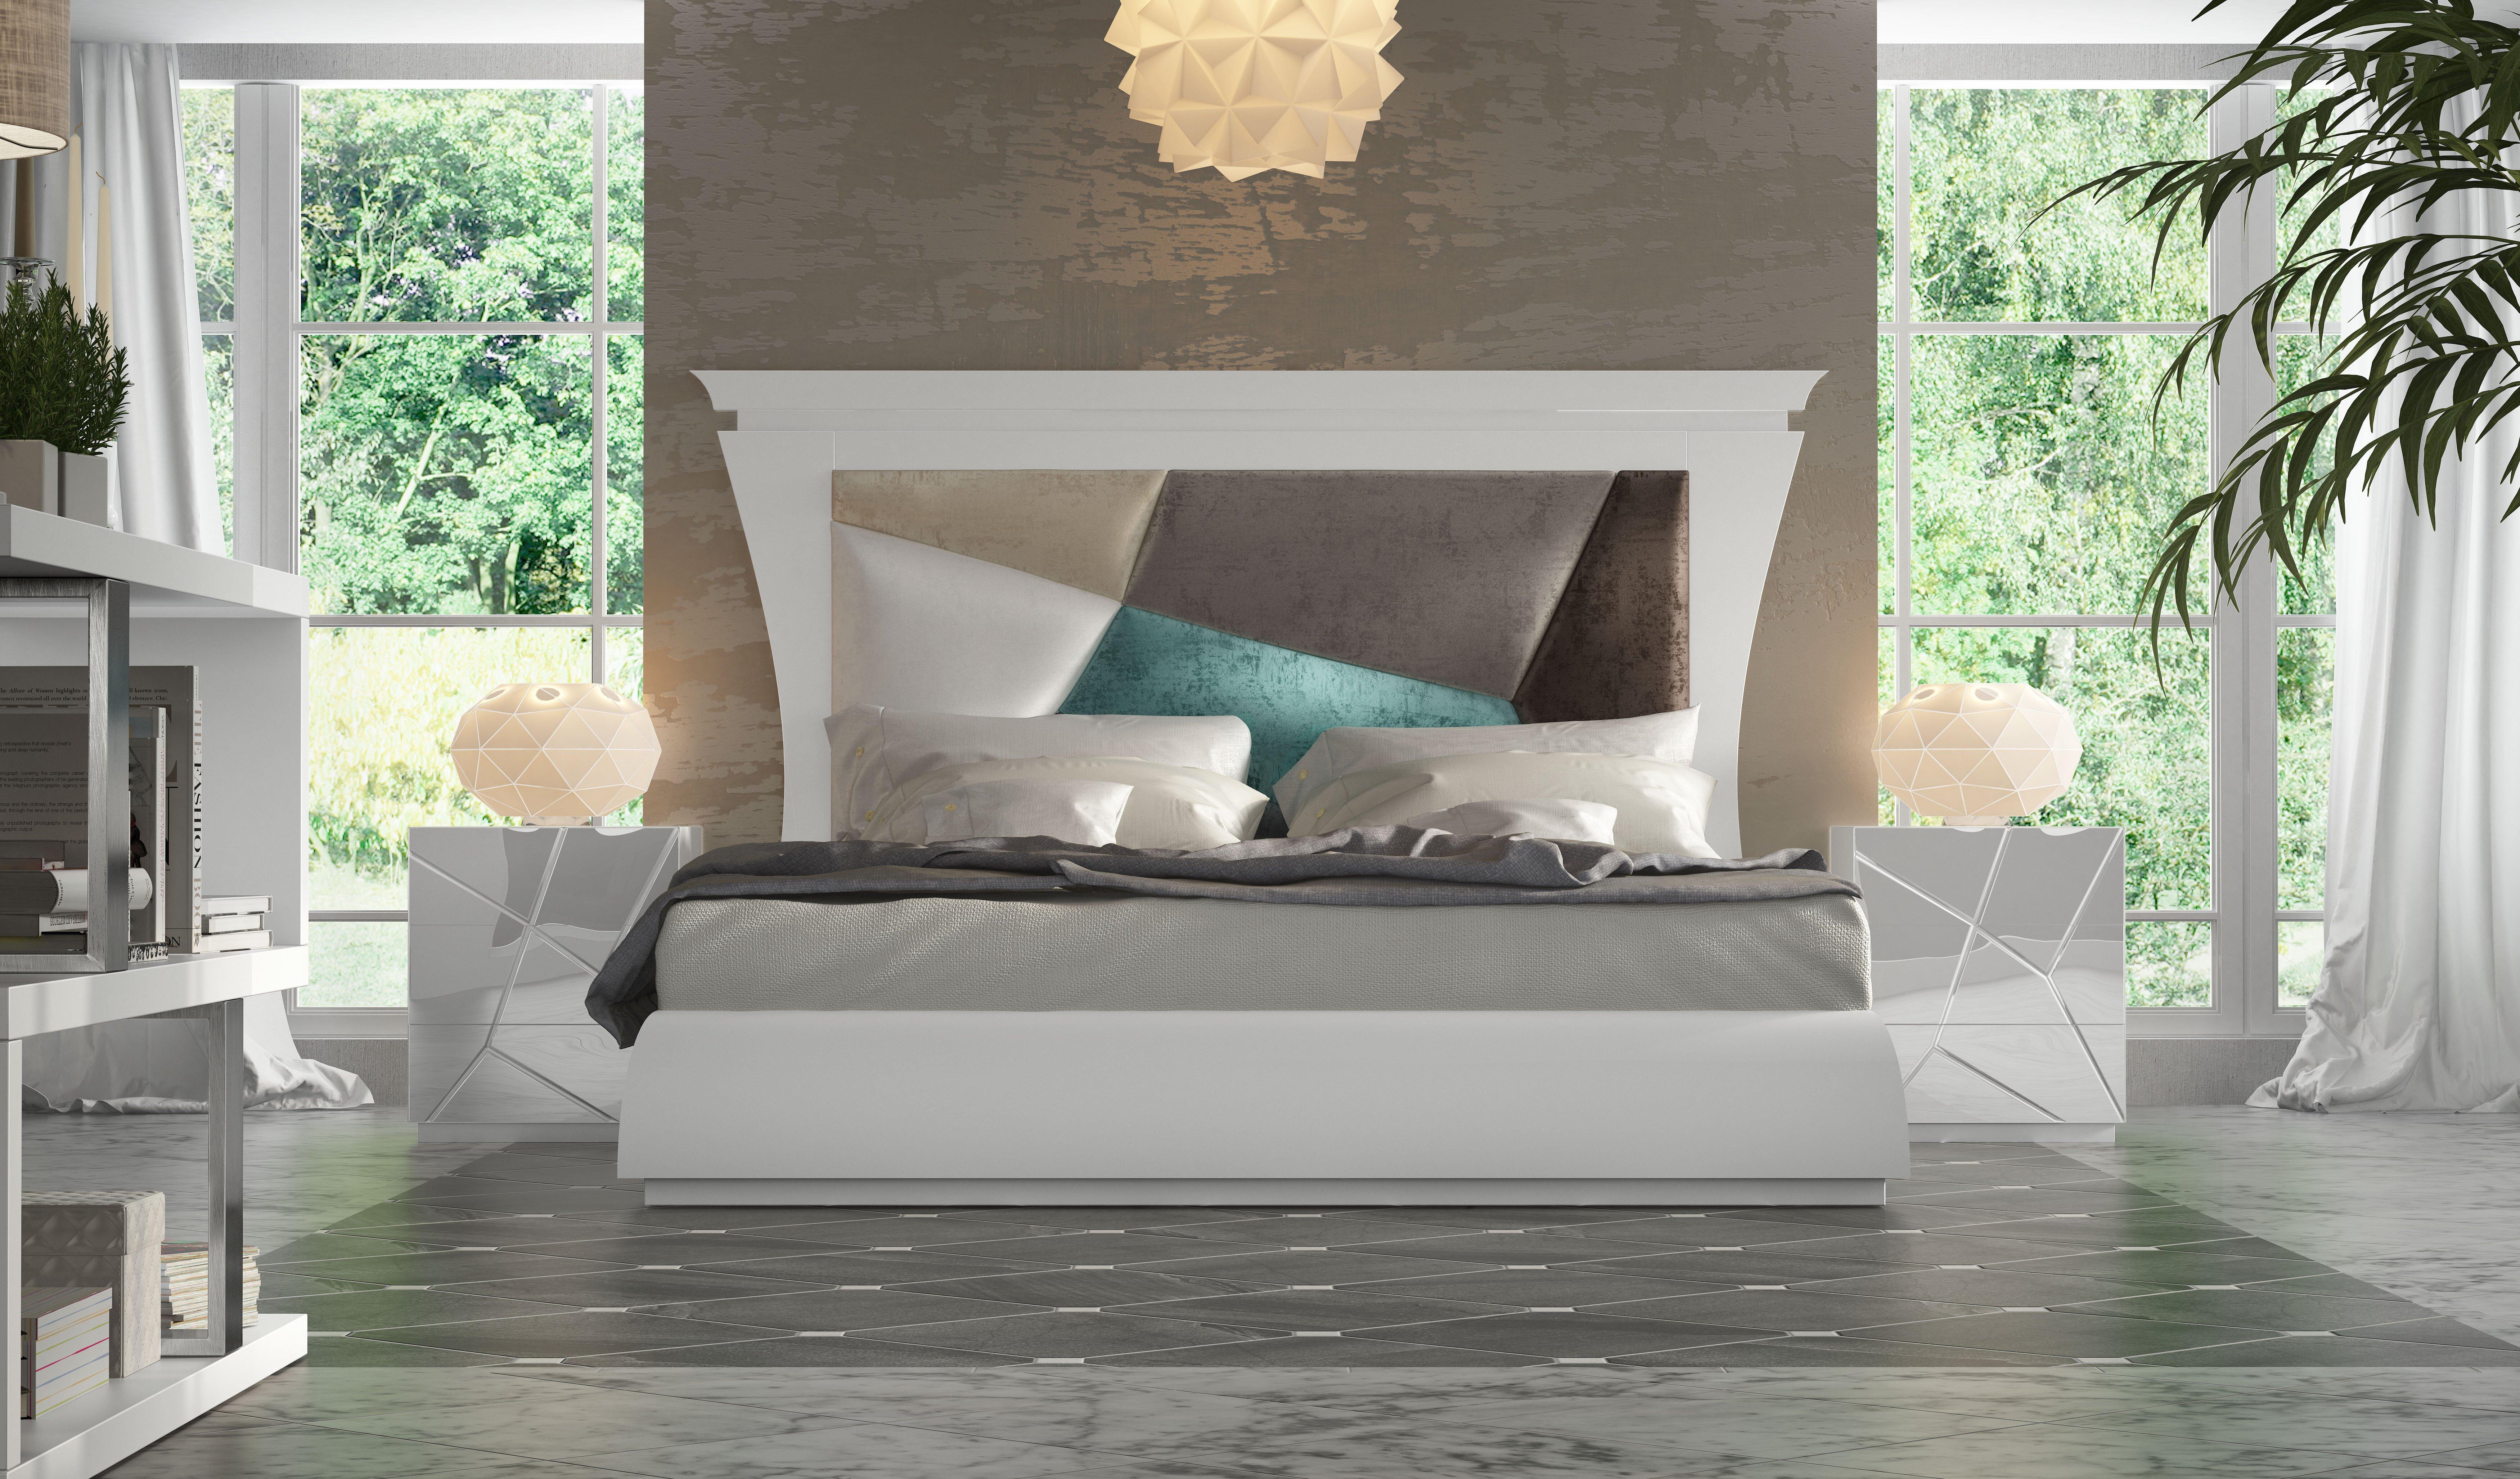 King Size Canopy Bedroom Set Fresh Jerri King Platform 3 Piece Bedroom Set